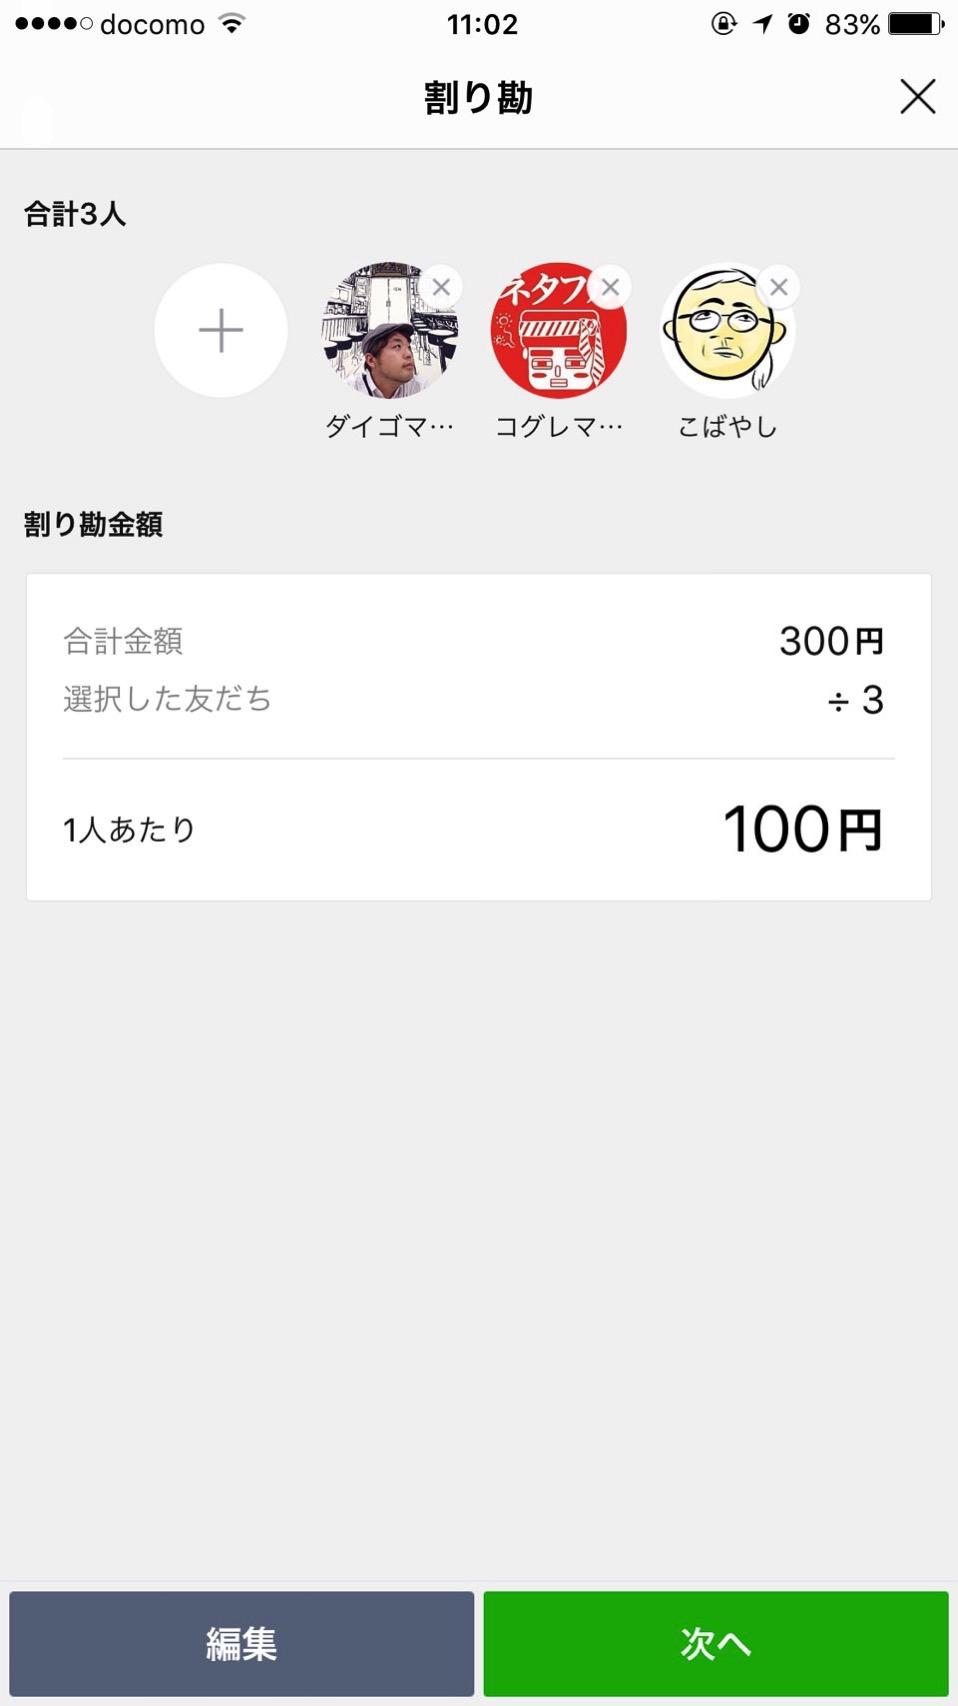 Line pay warikan 6793